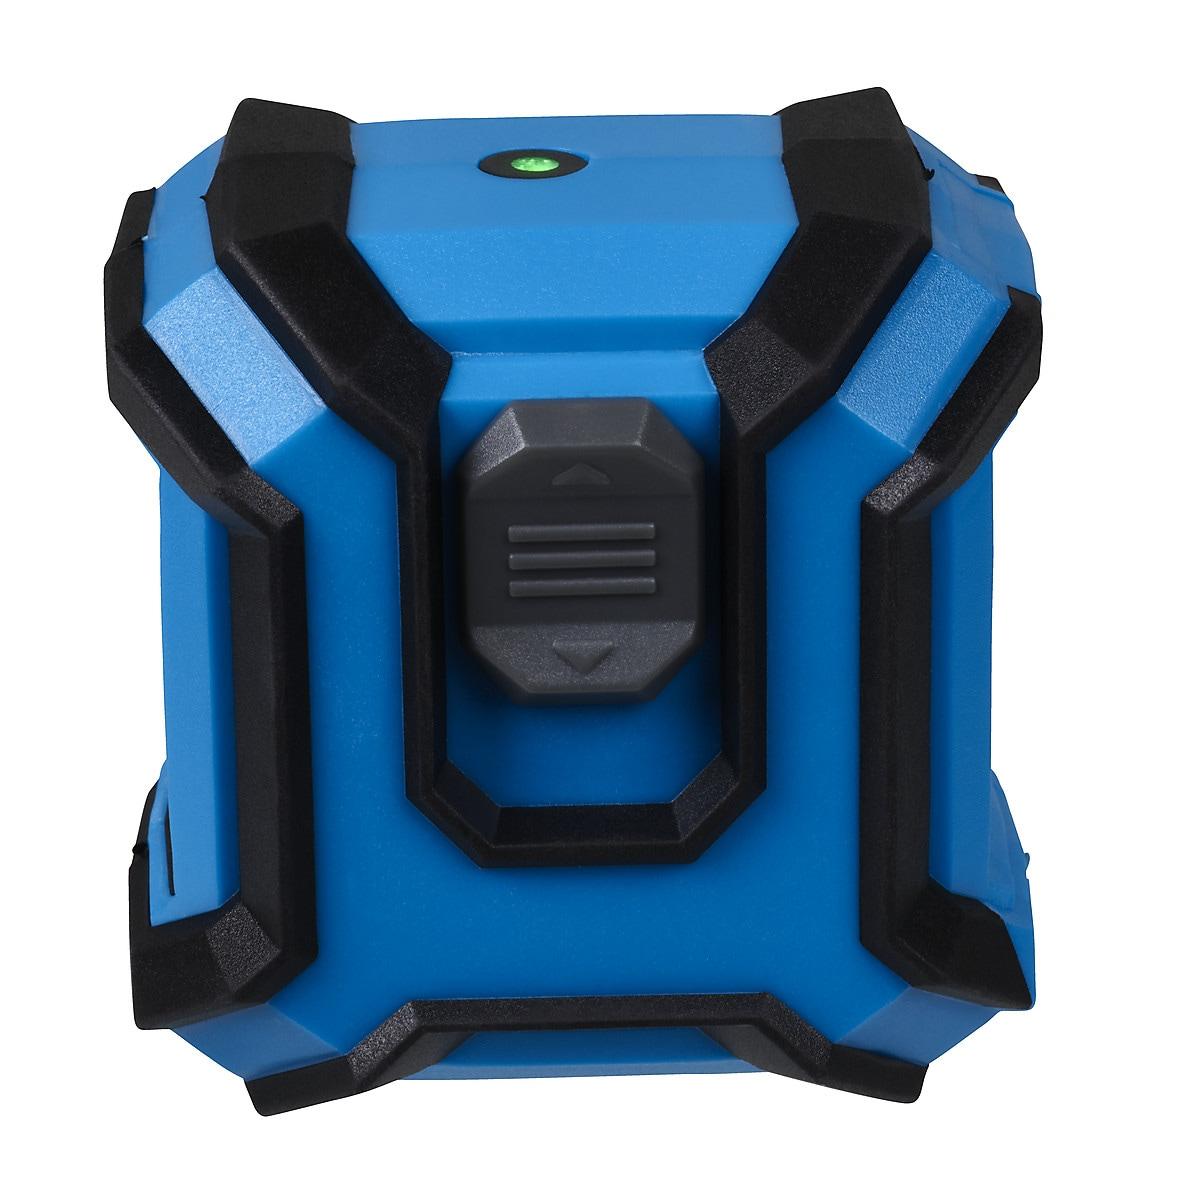 Cocraft HL10-S krysslaser